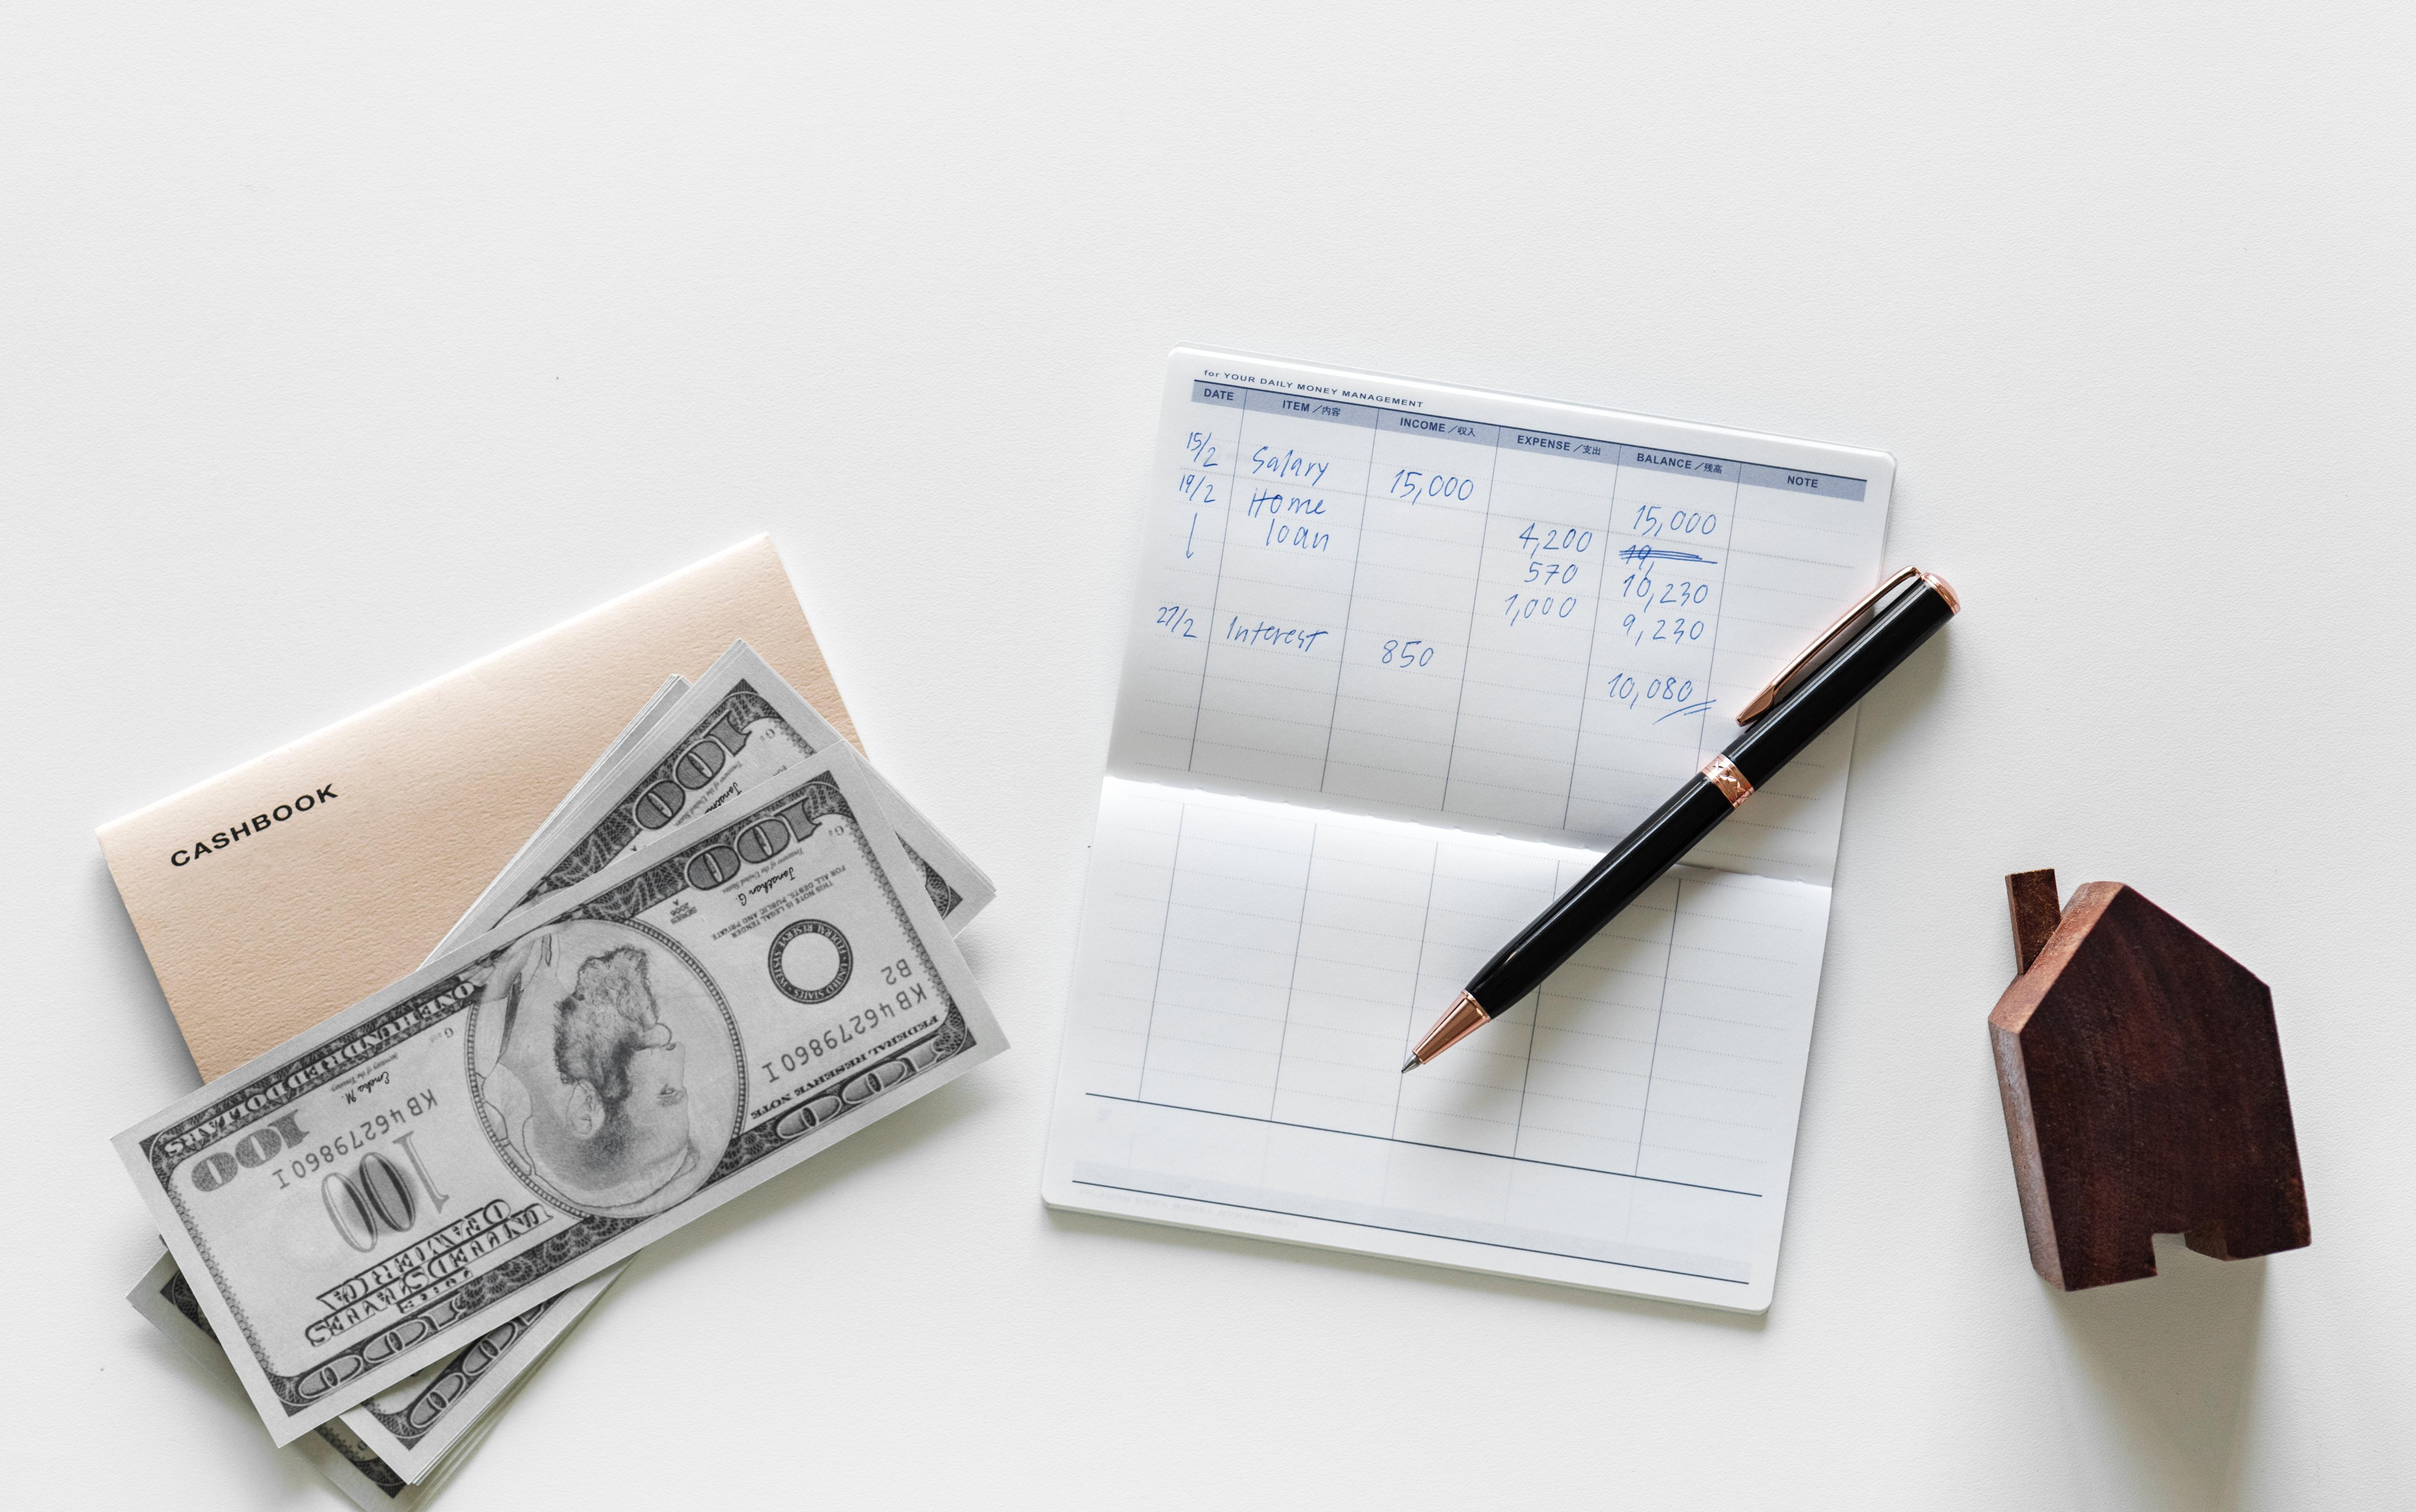 Tres consejos que te ayudarán a ahorrar para tu retiro